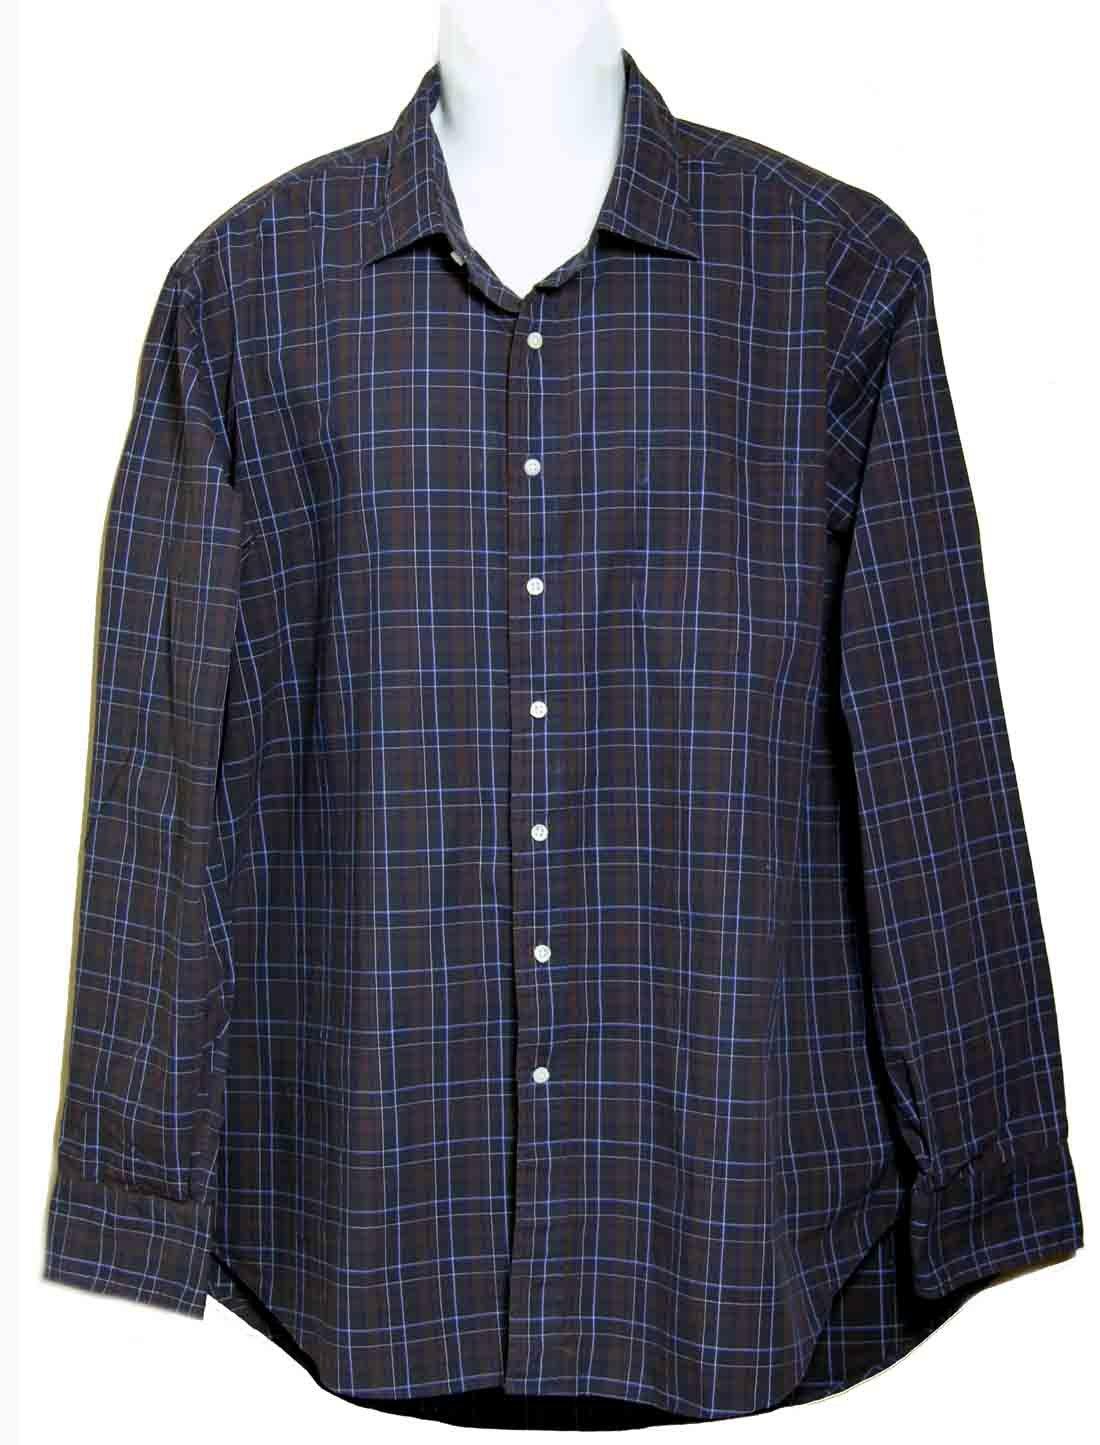 Sid Mashburn Shirt Plaid Brown Black Cotton Men's Size 2XL